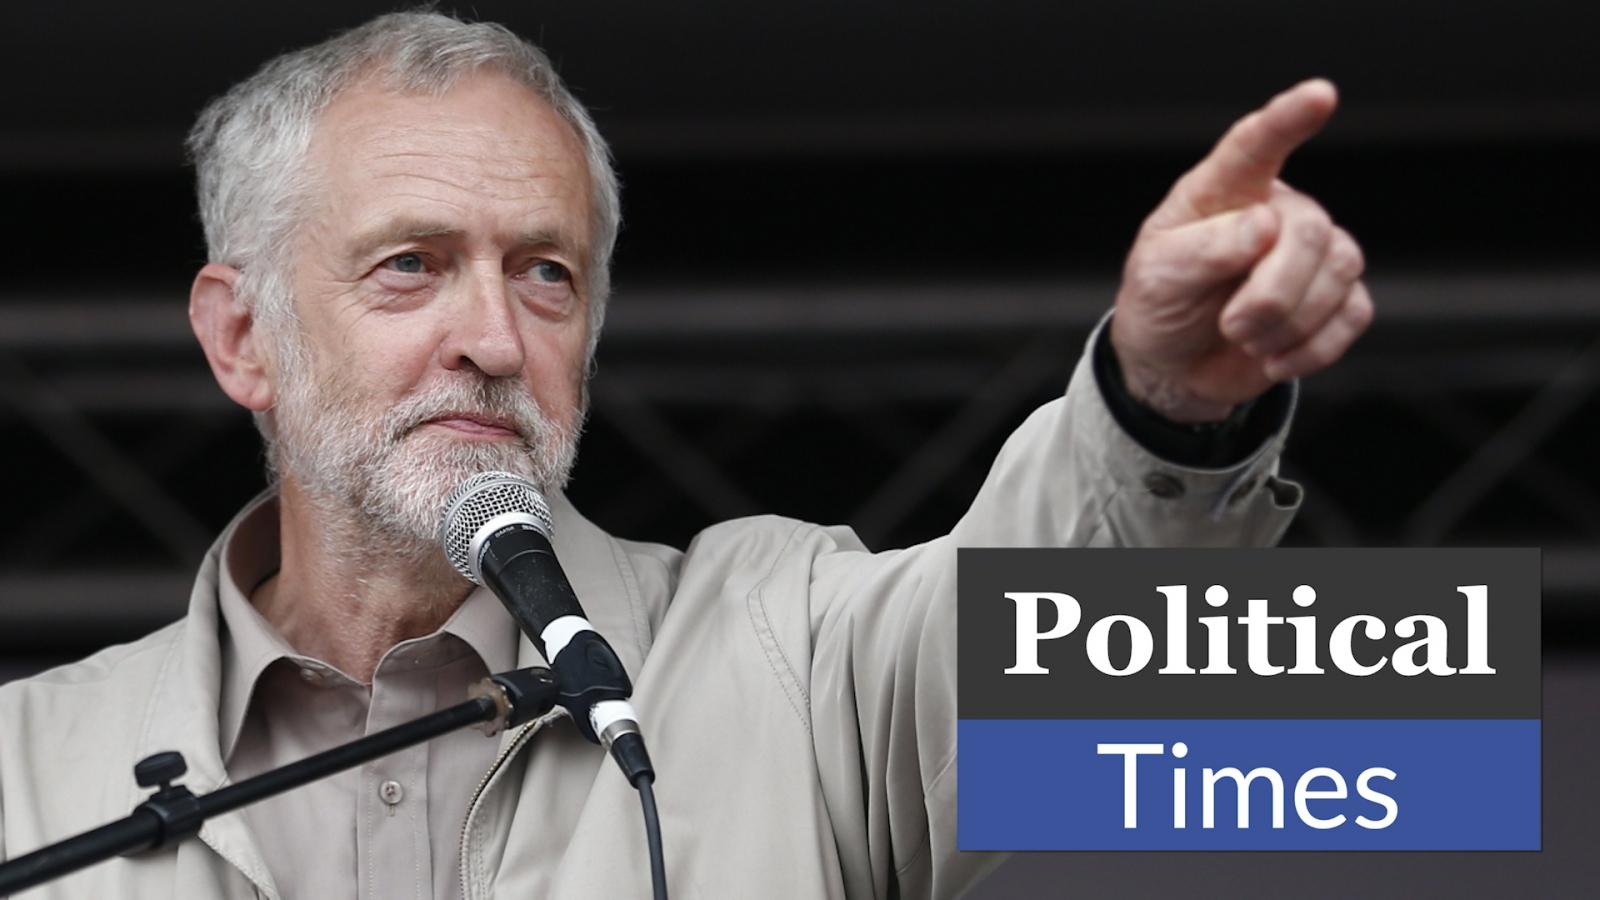 Political Times